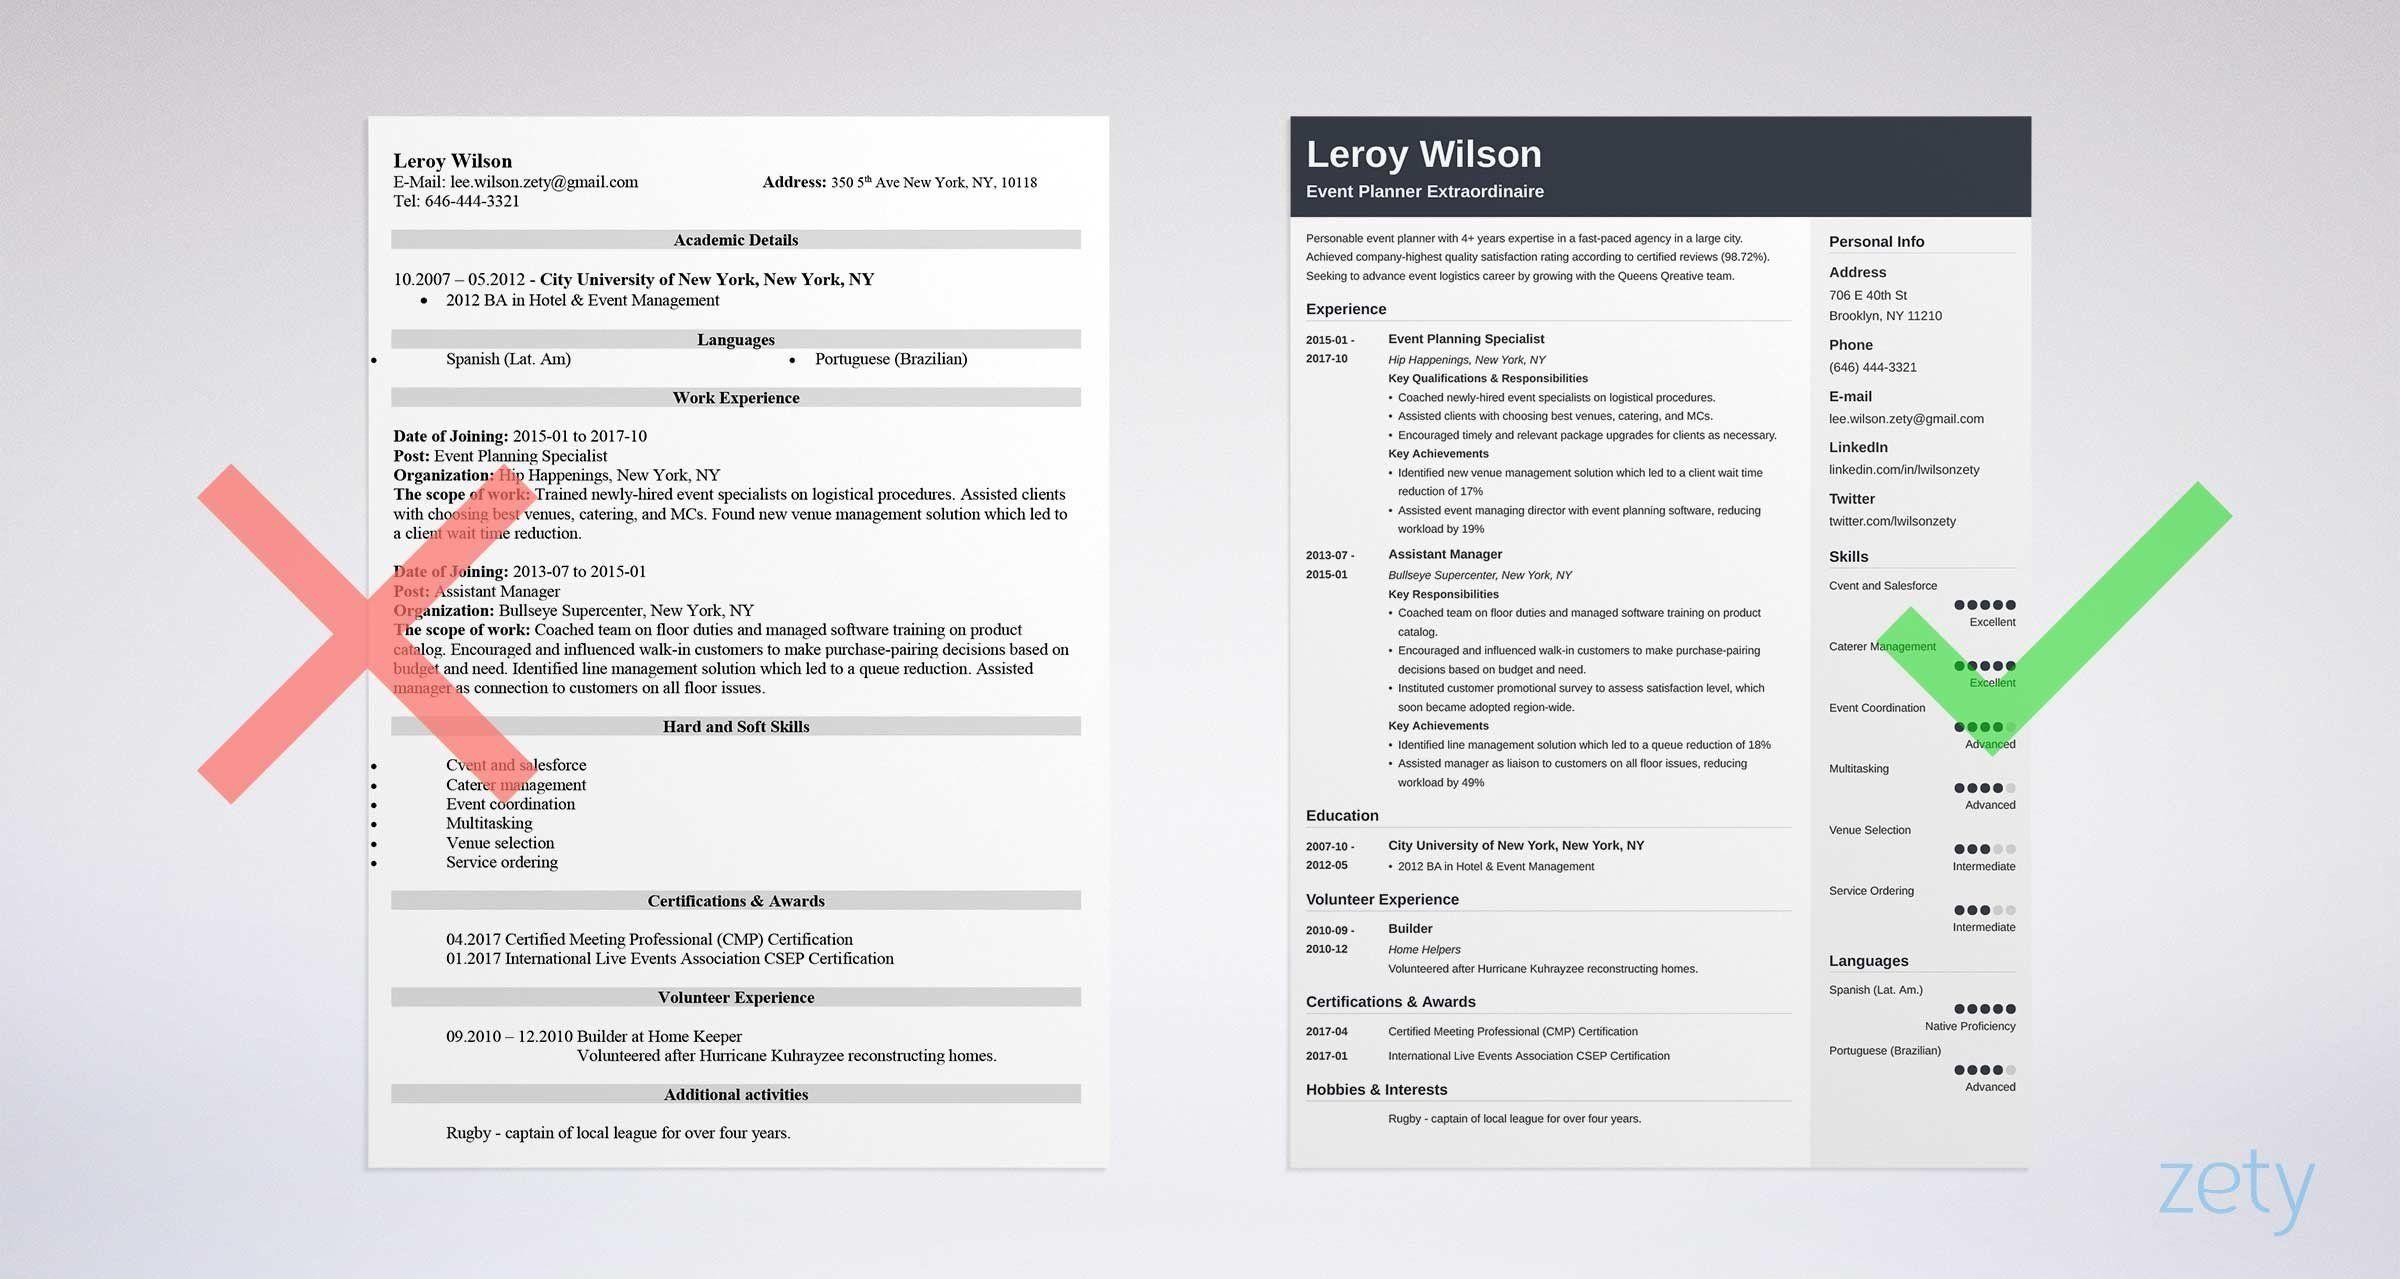 Event planner coordinator resume sample job